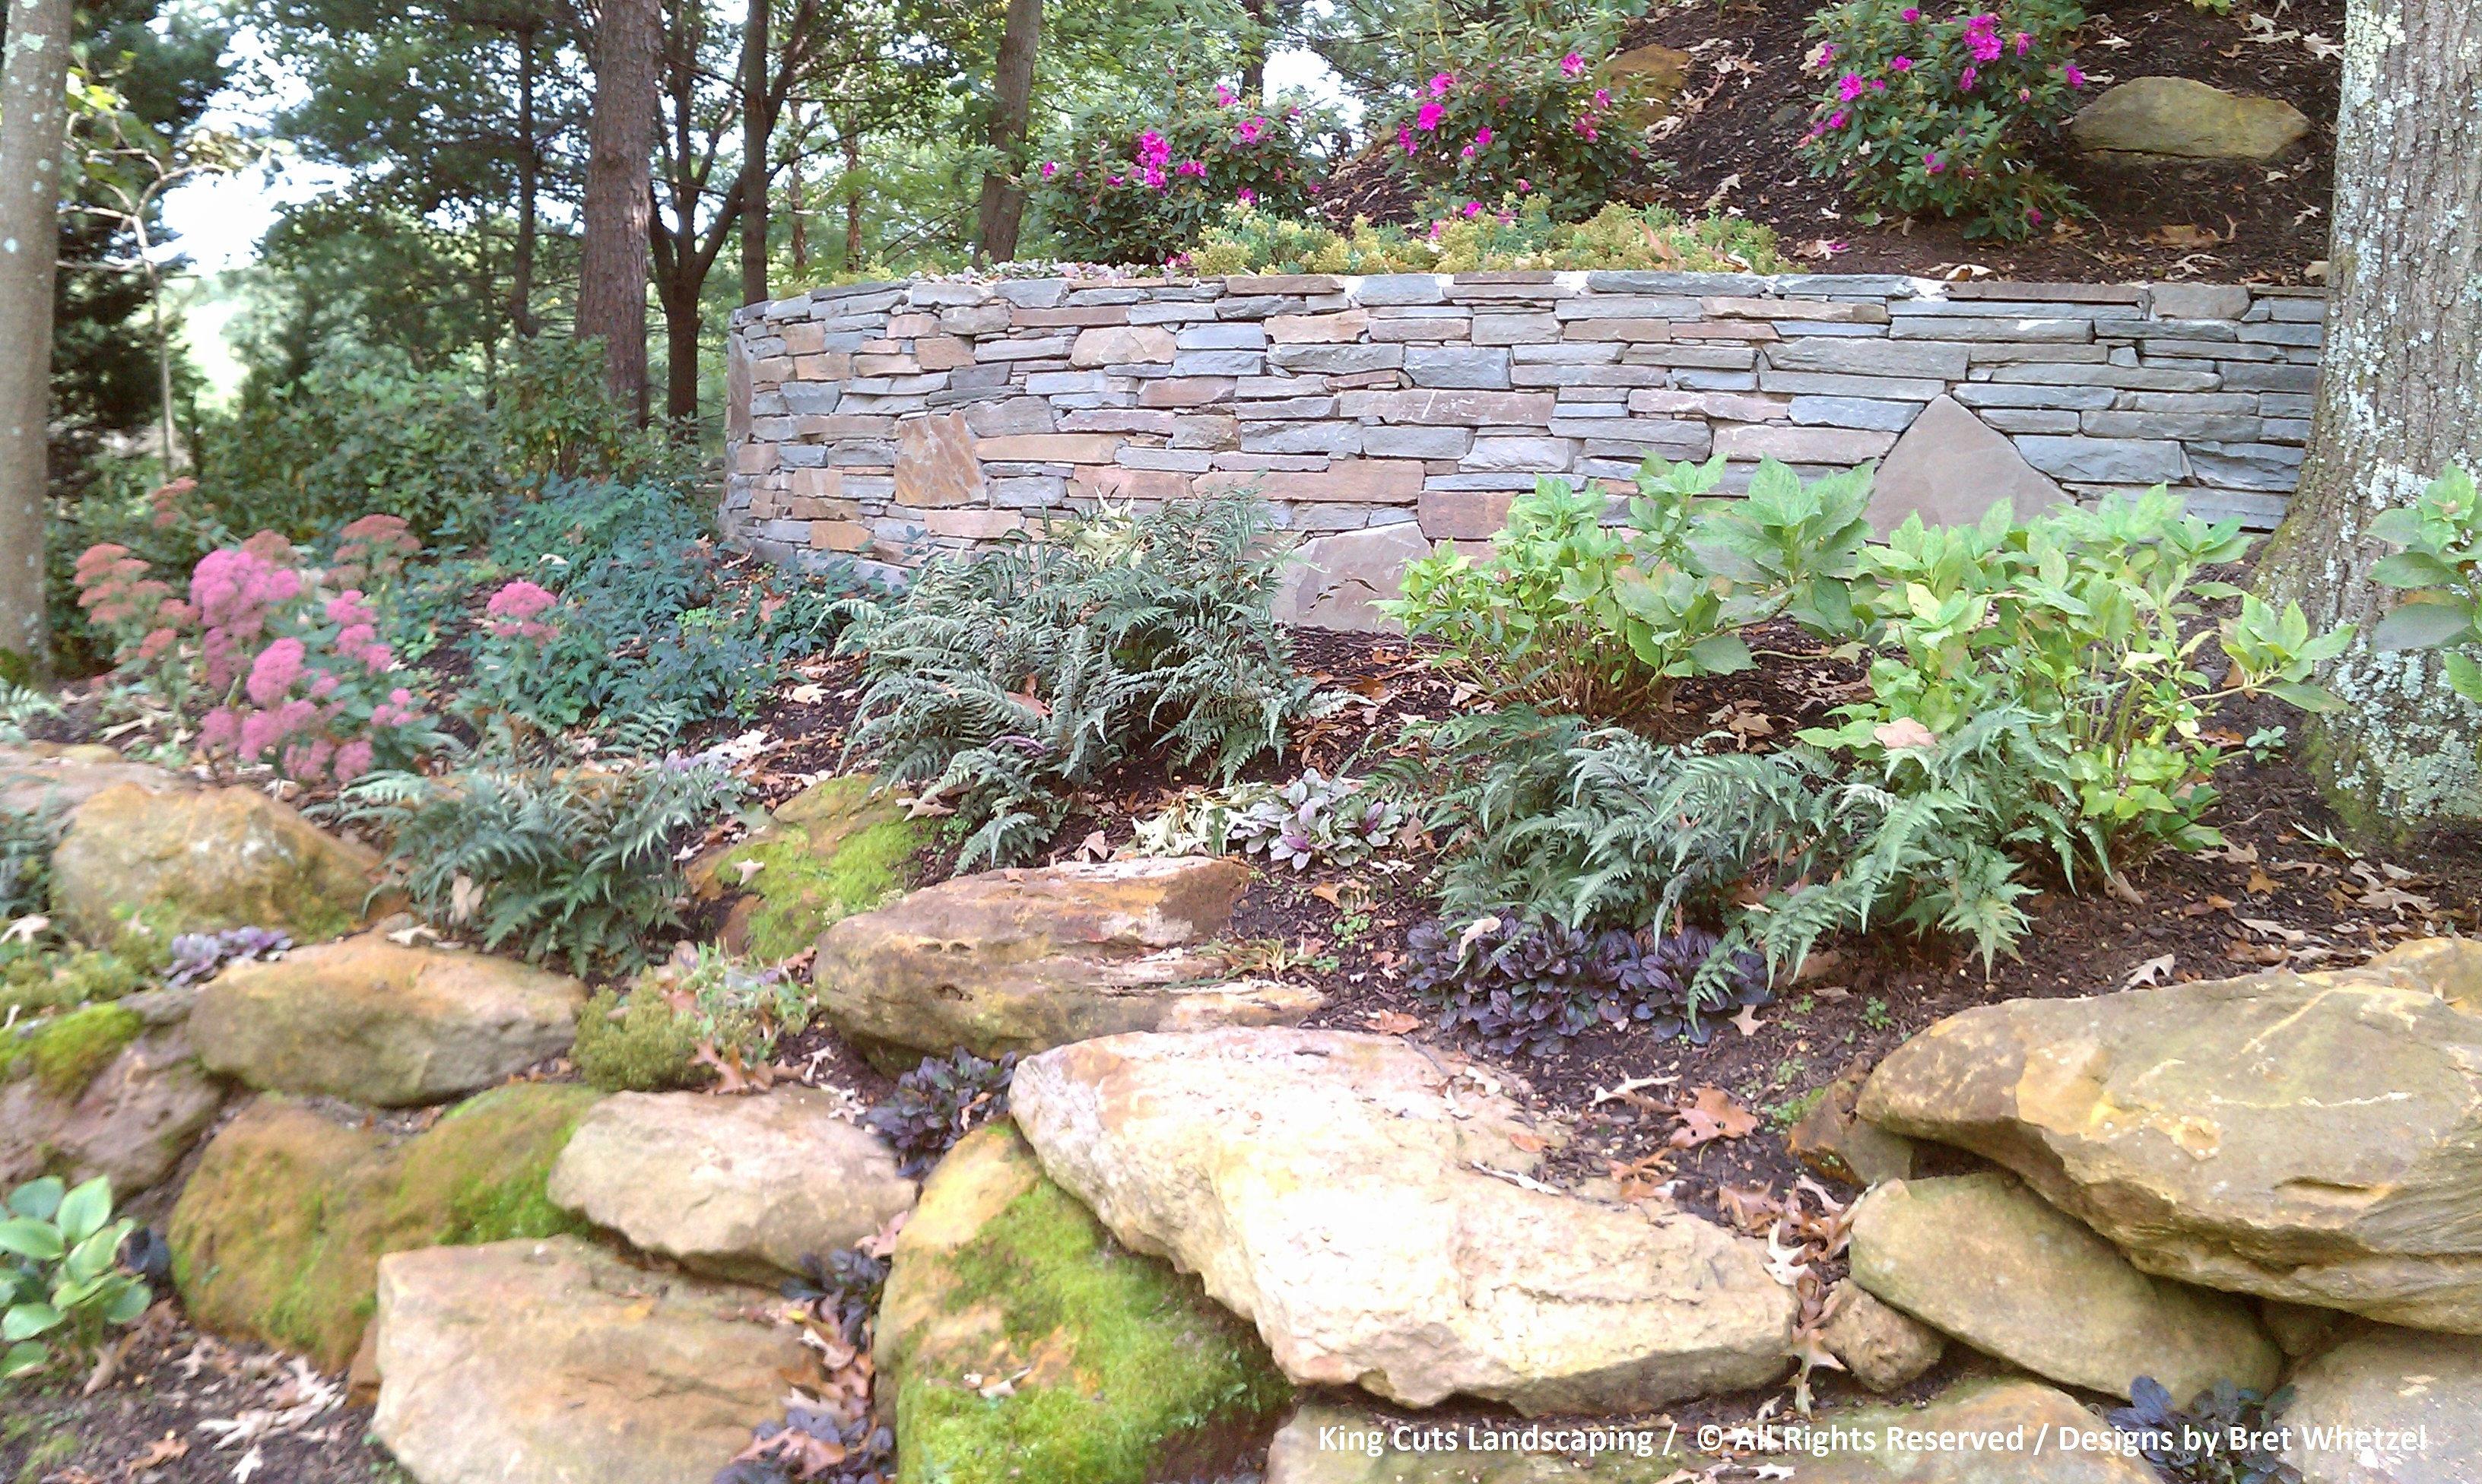 18 patio pavers landscaping annapolis md hardscape patios a